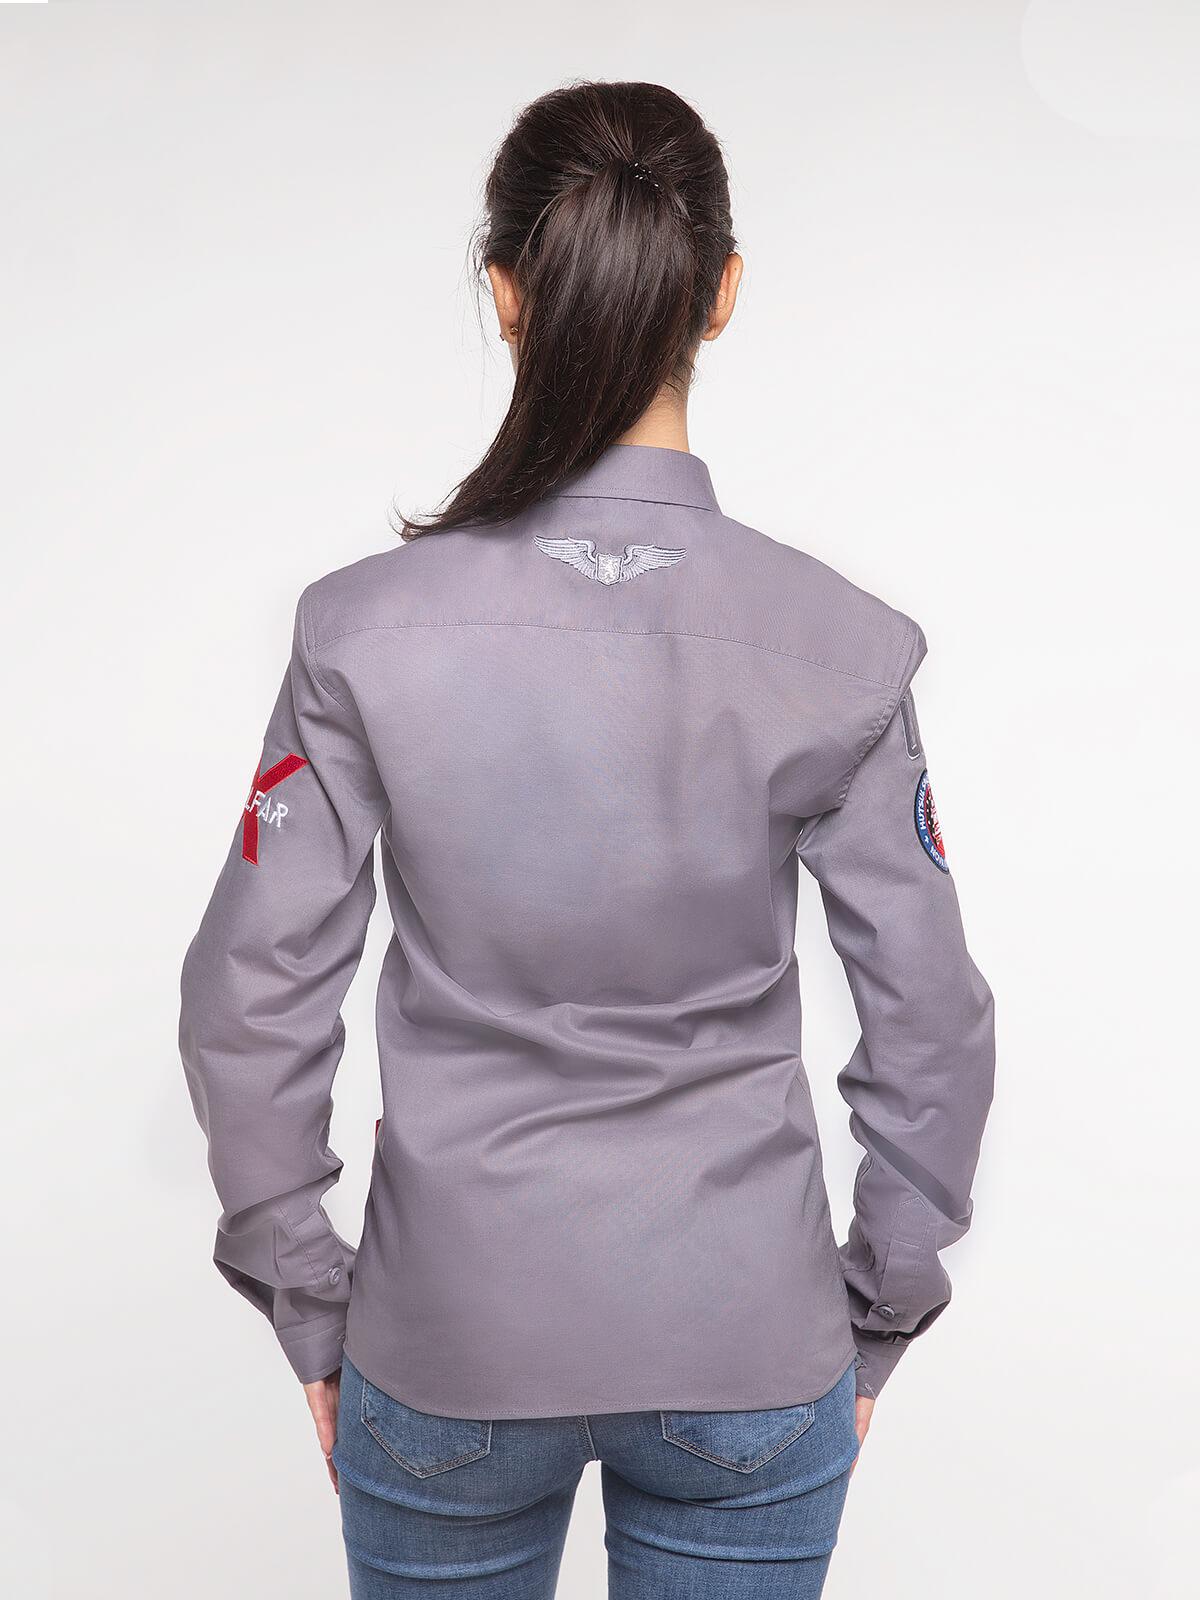 Women's Shirt Molfar-X. Color gray.  Technique of prints applied: embroidery, silkscreen printing.